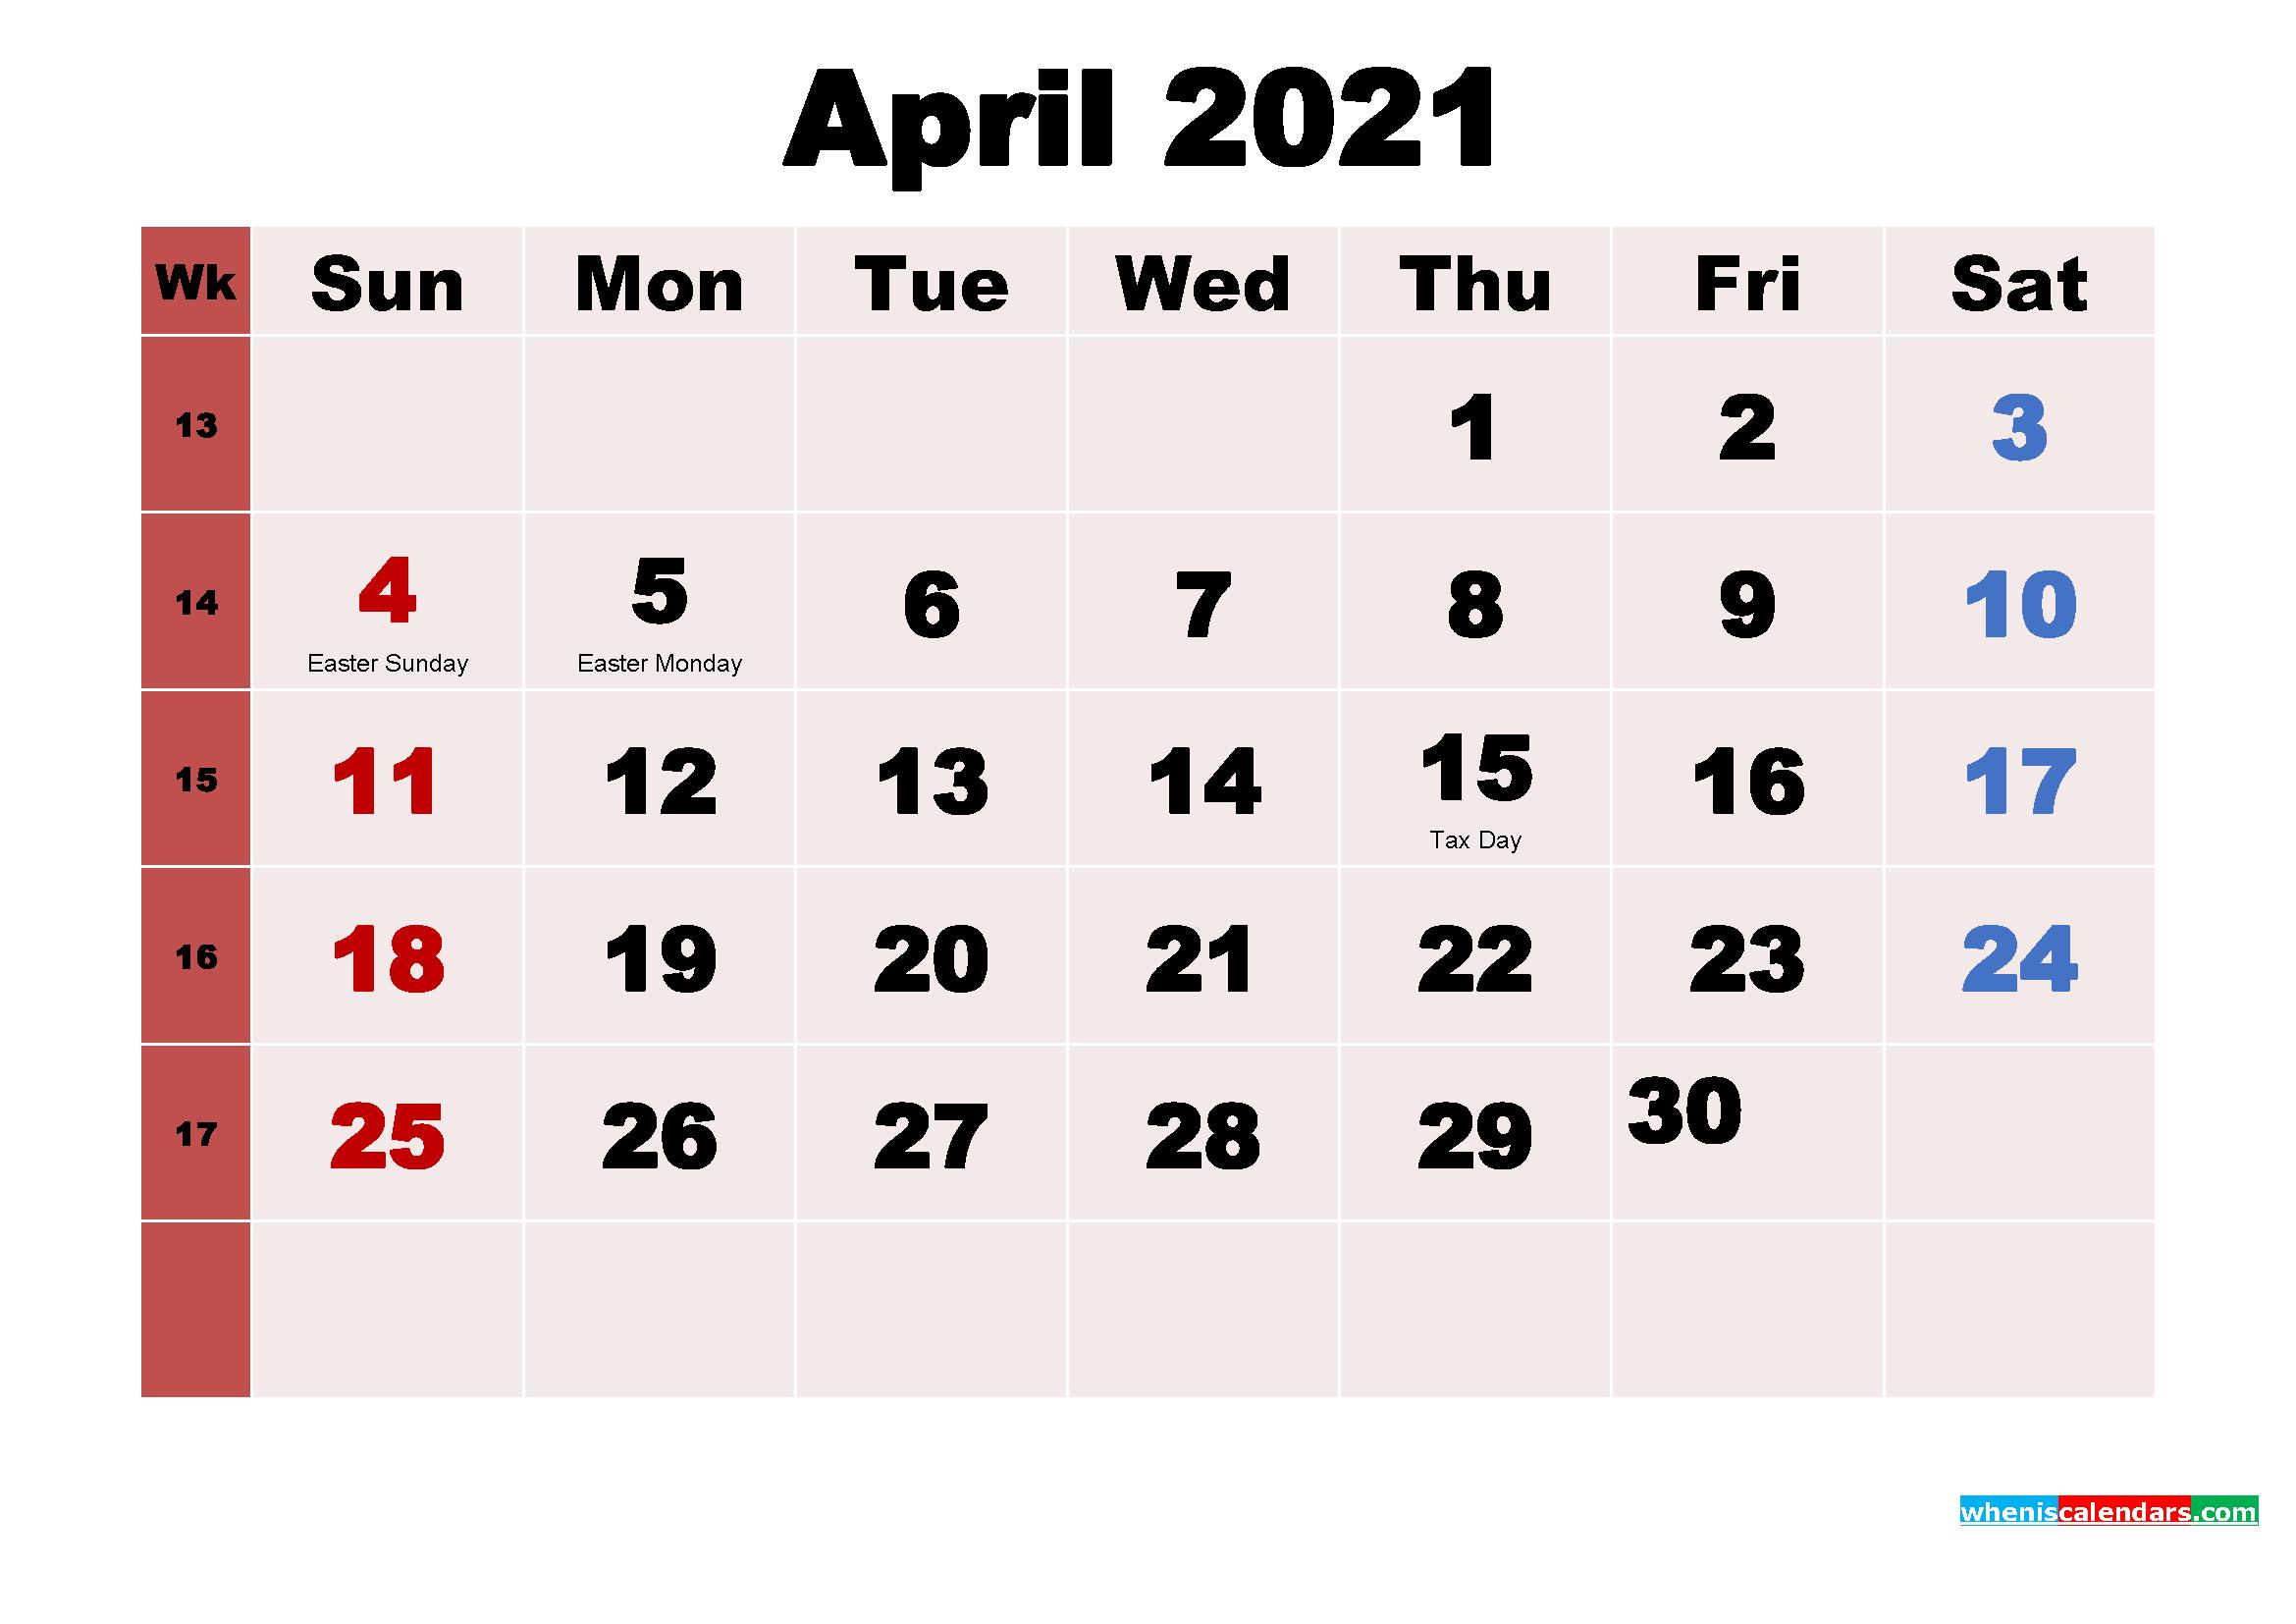 April 2021 Calendar Wallpaper Free Download